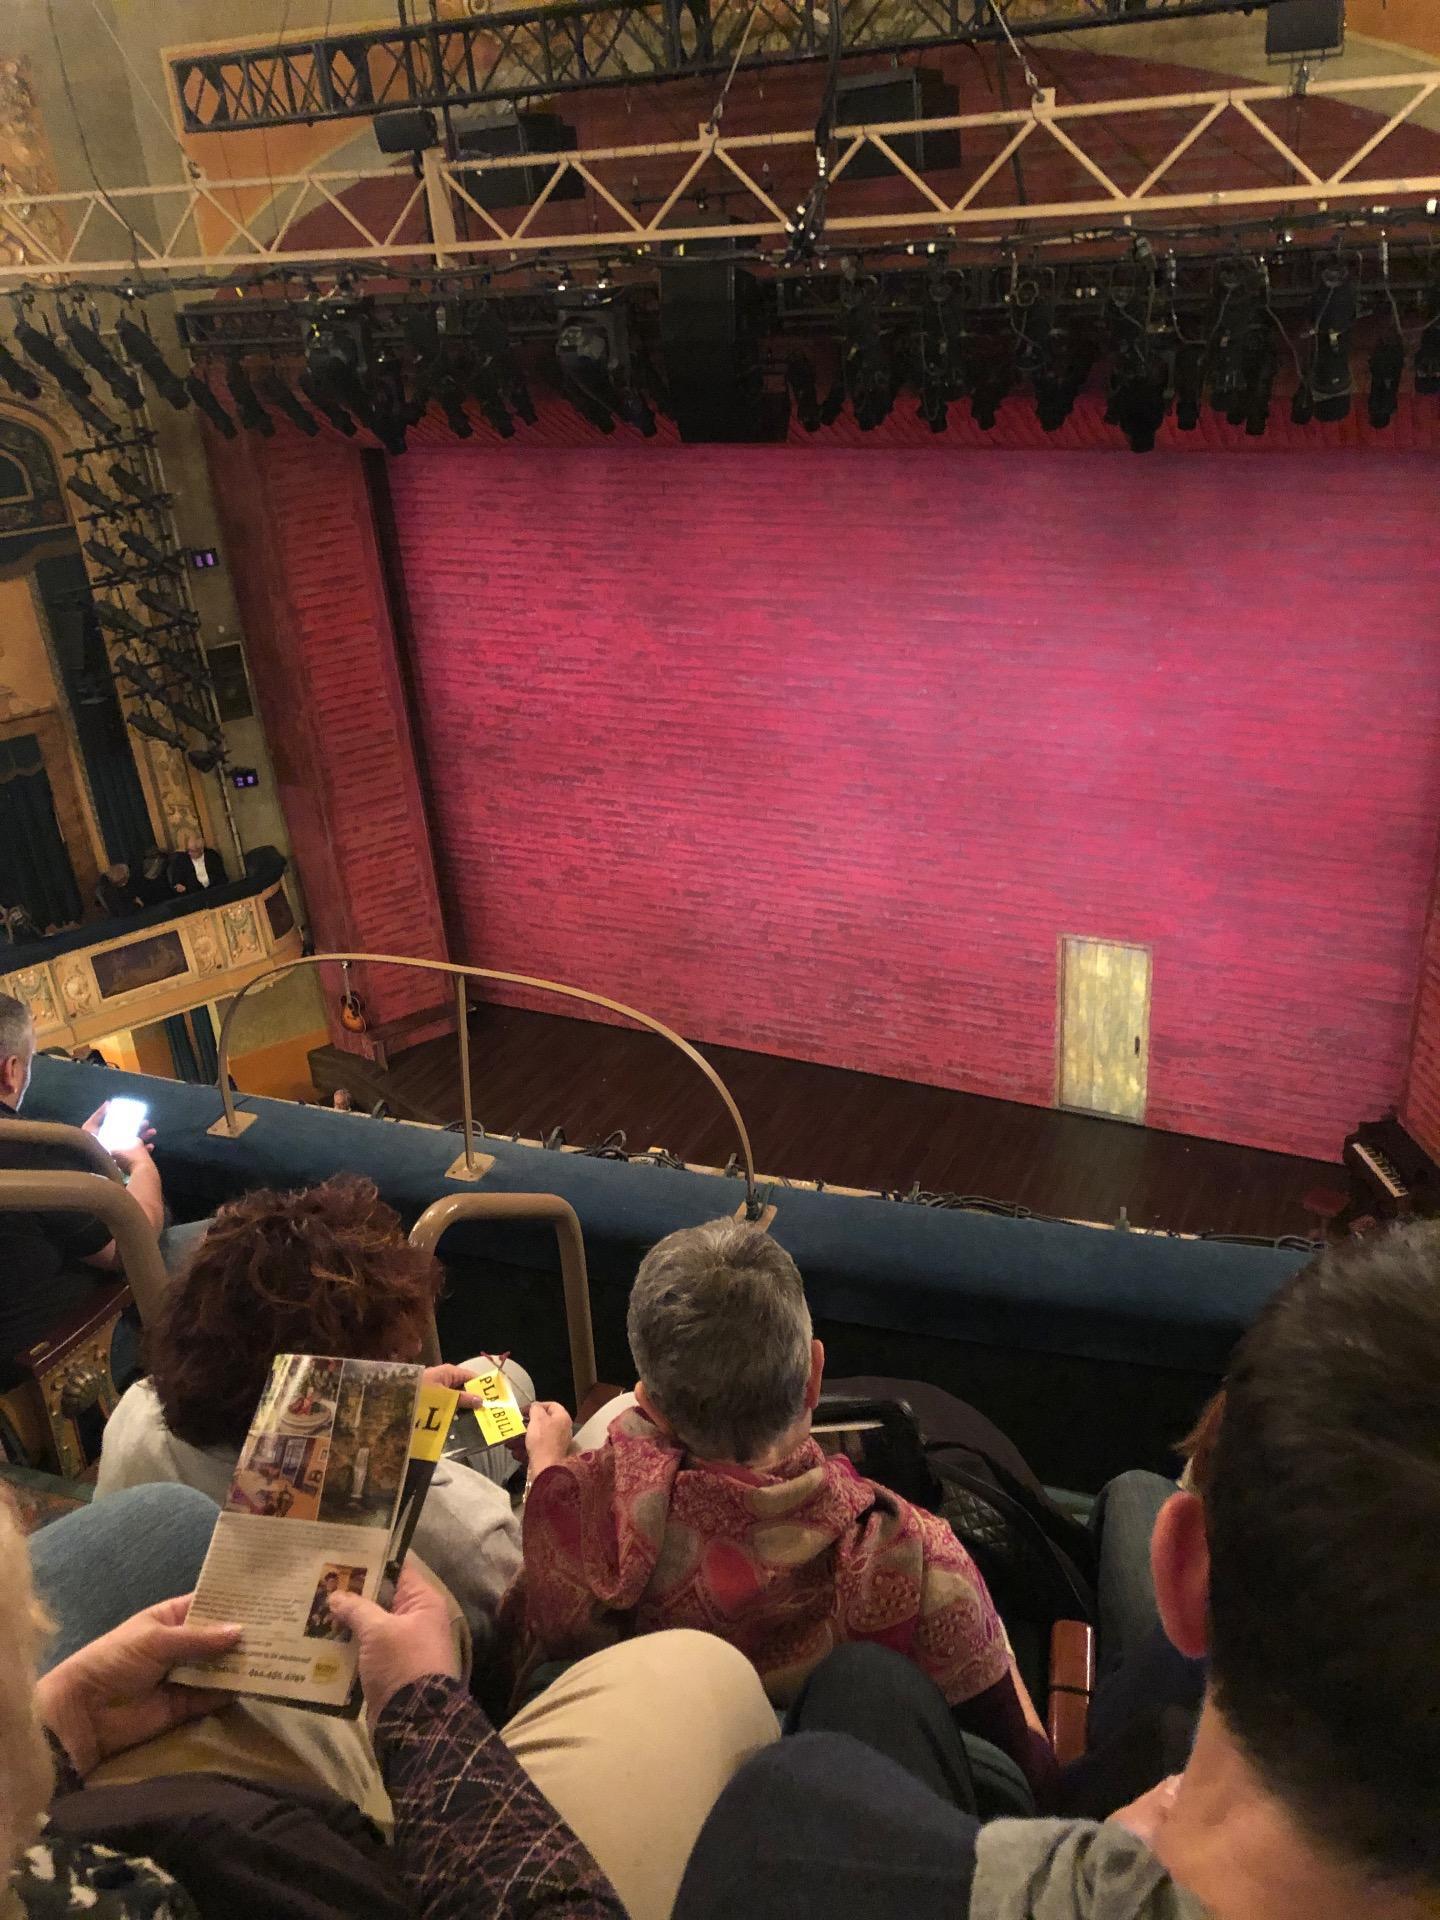 Shubert Theatre Section Balcony R Row D Seat 8